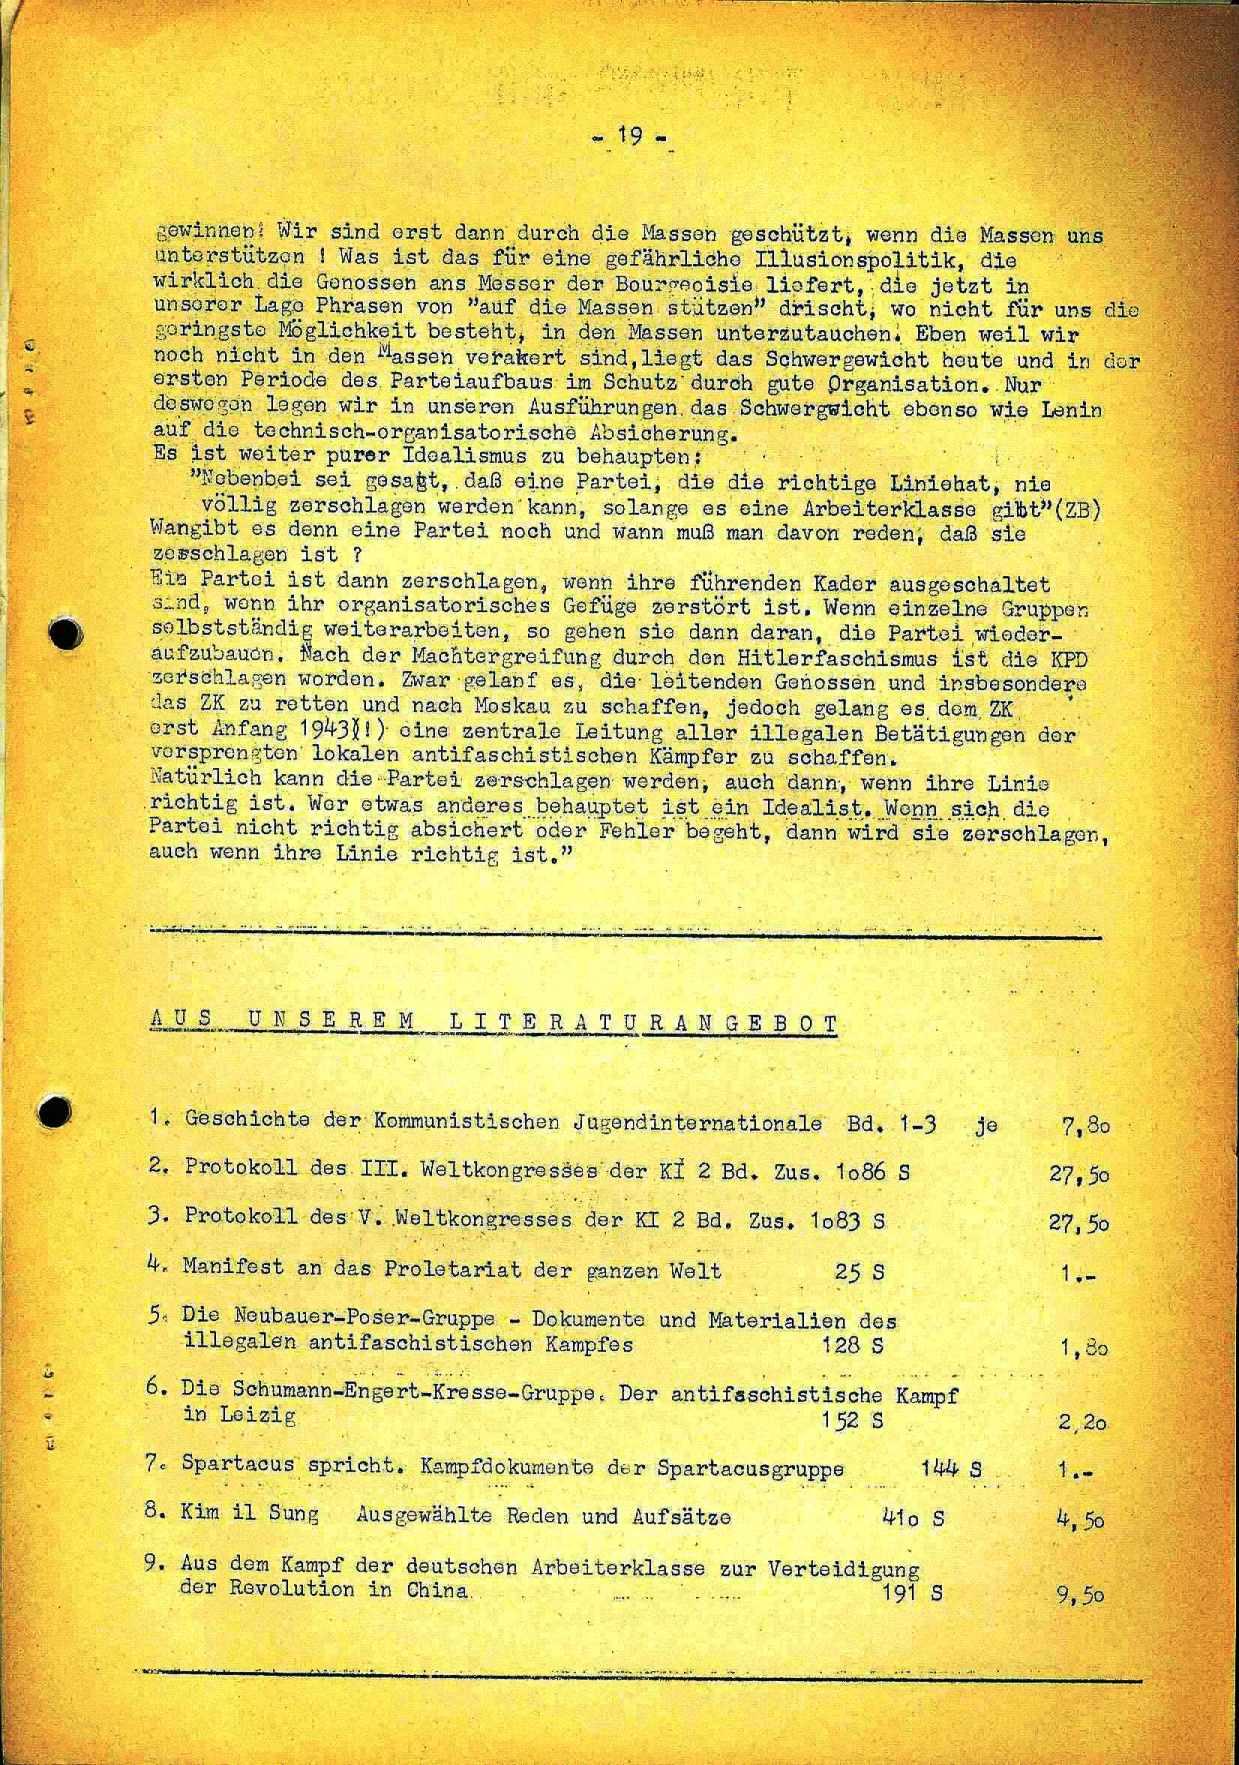 Weinfurth115